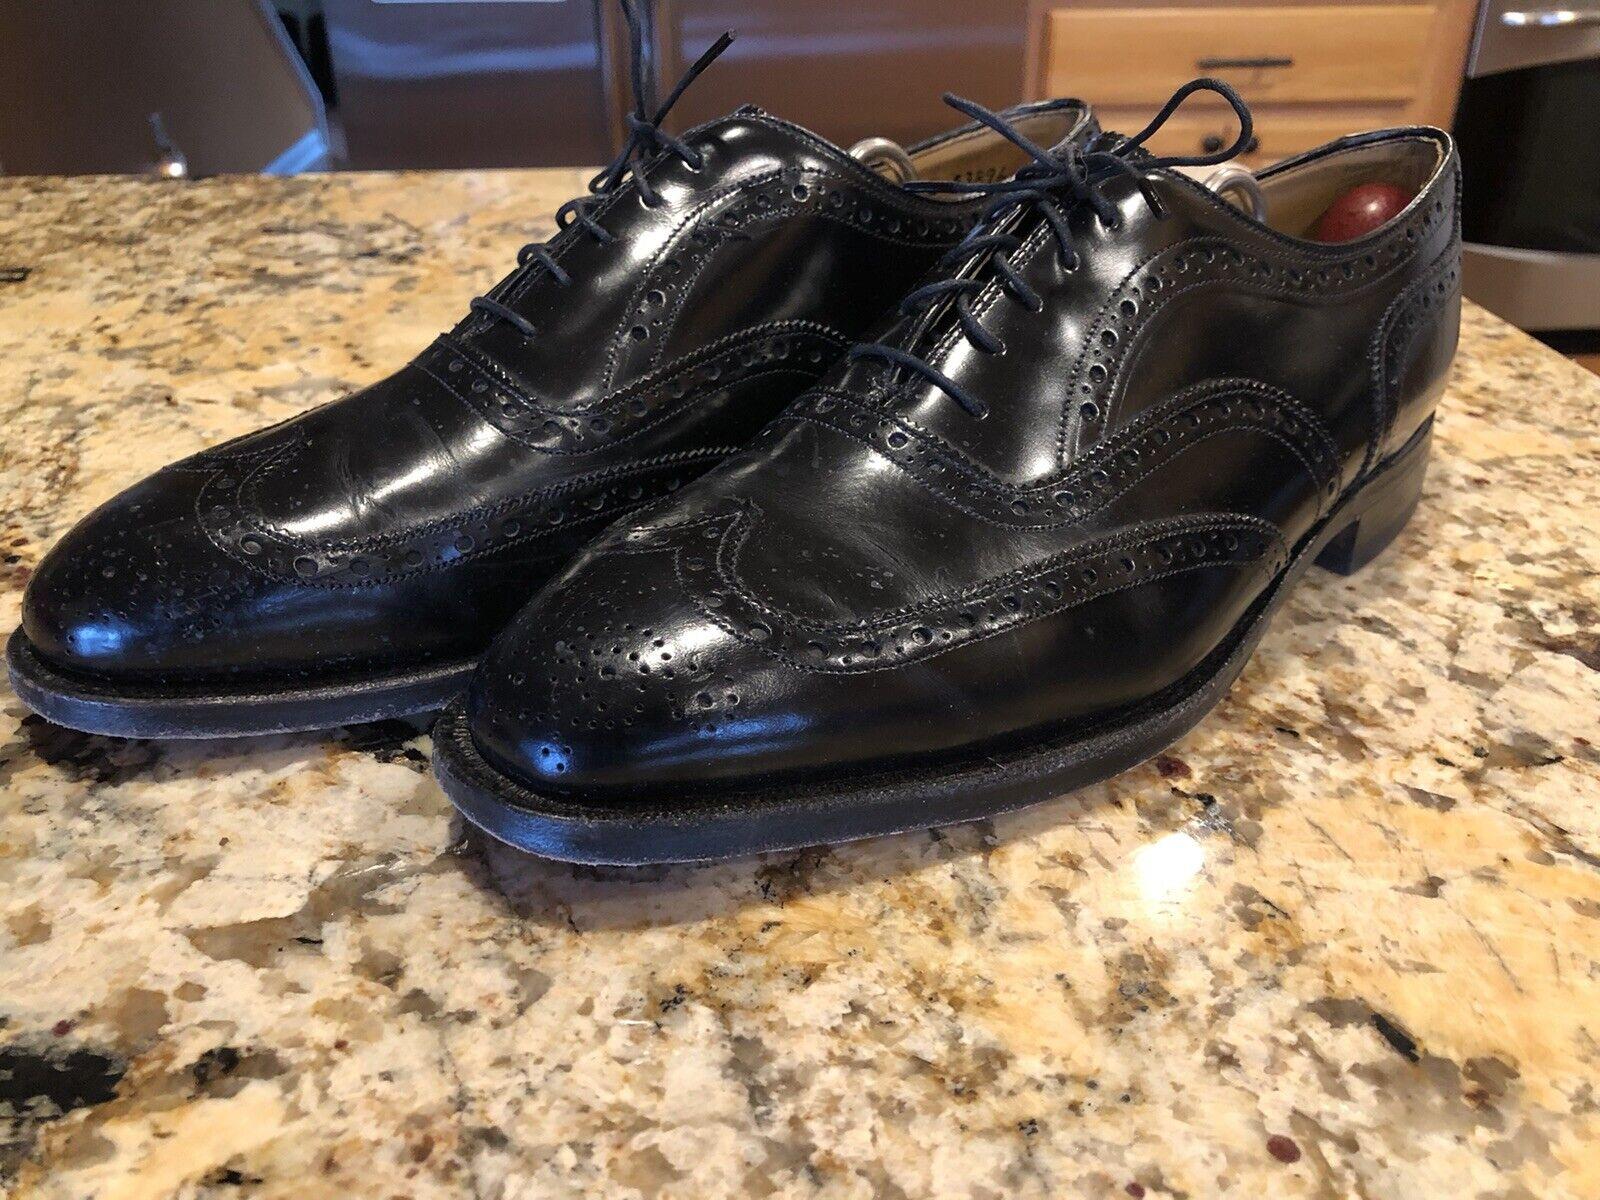 Johnston & Murphy Aristocrat Men's Black Leather Oxfords Size 9